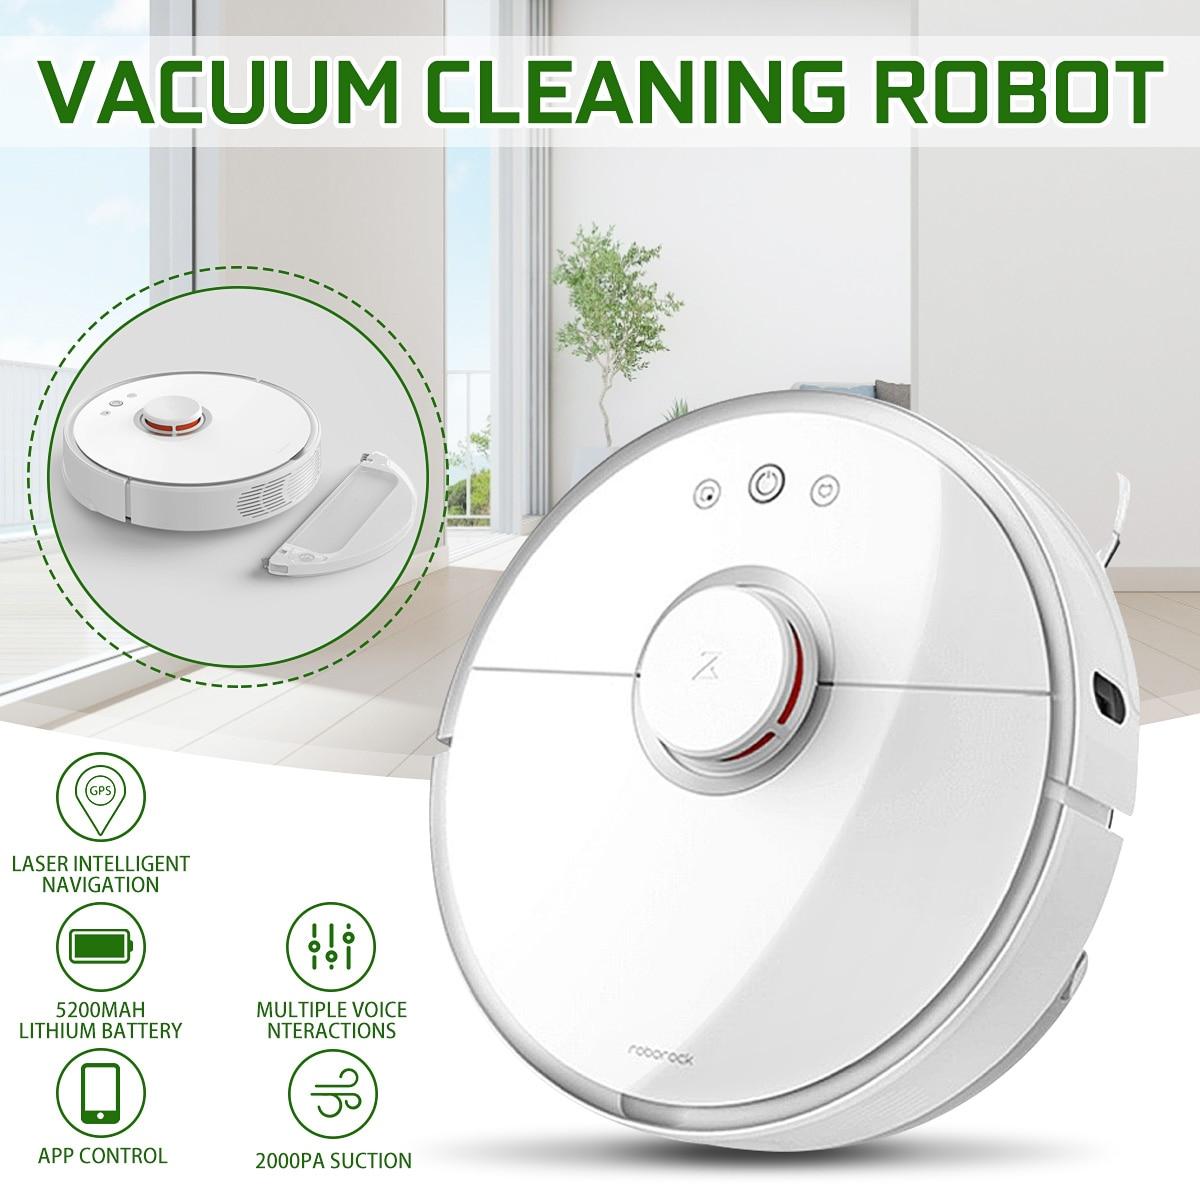 Roborock S50 XIAOMI Vacuum 2 Cleaner Smart Planned Wifi Wet Dry MIJIA Robot Home Automotic Sweeping Dust Sterilize Washin